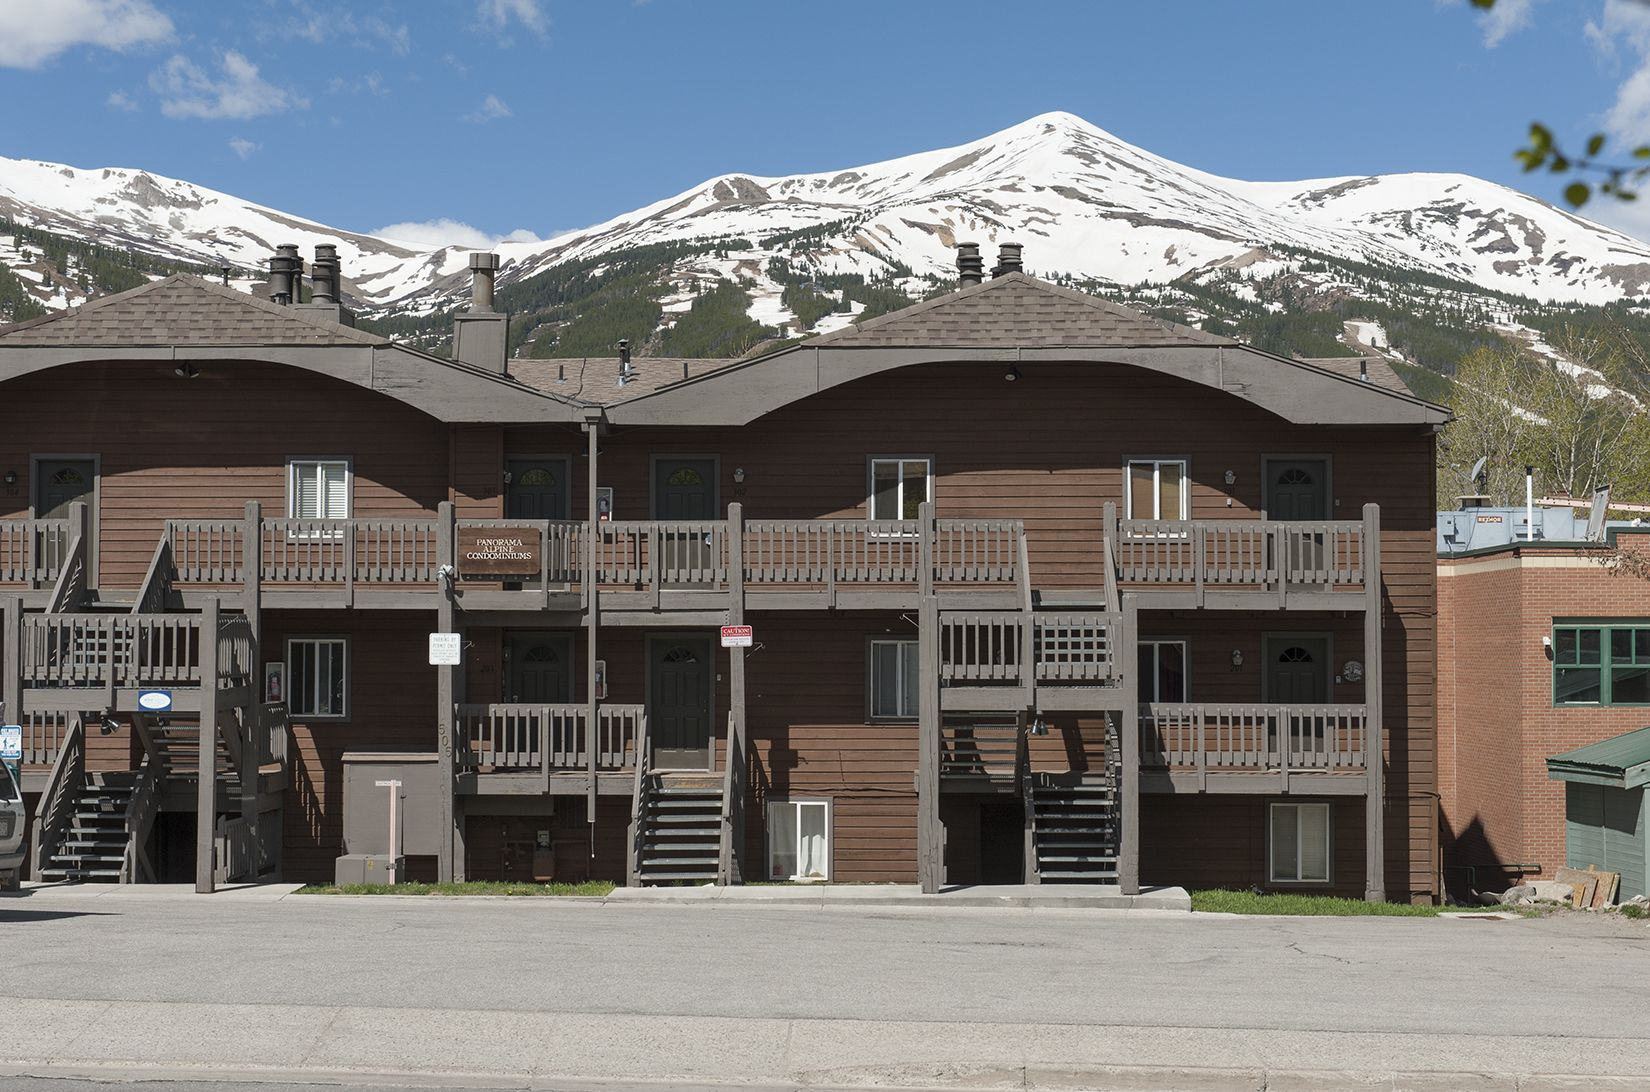 505 S Ridge STREET S # 302 BRECKENRIDGE, Colorado 80424